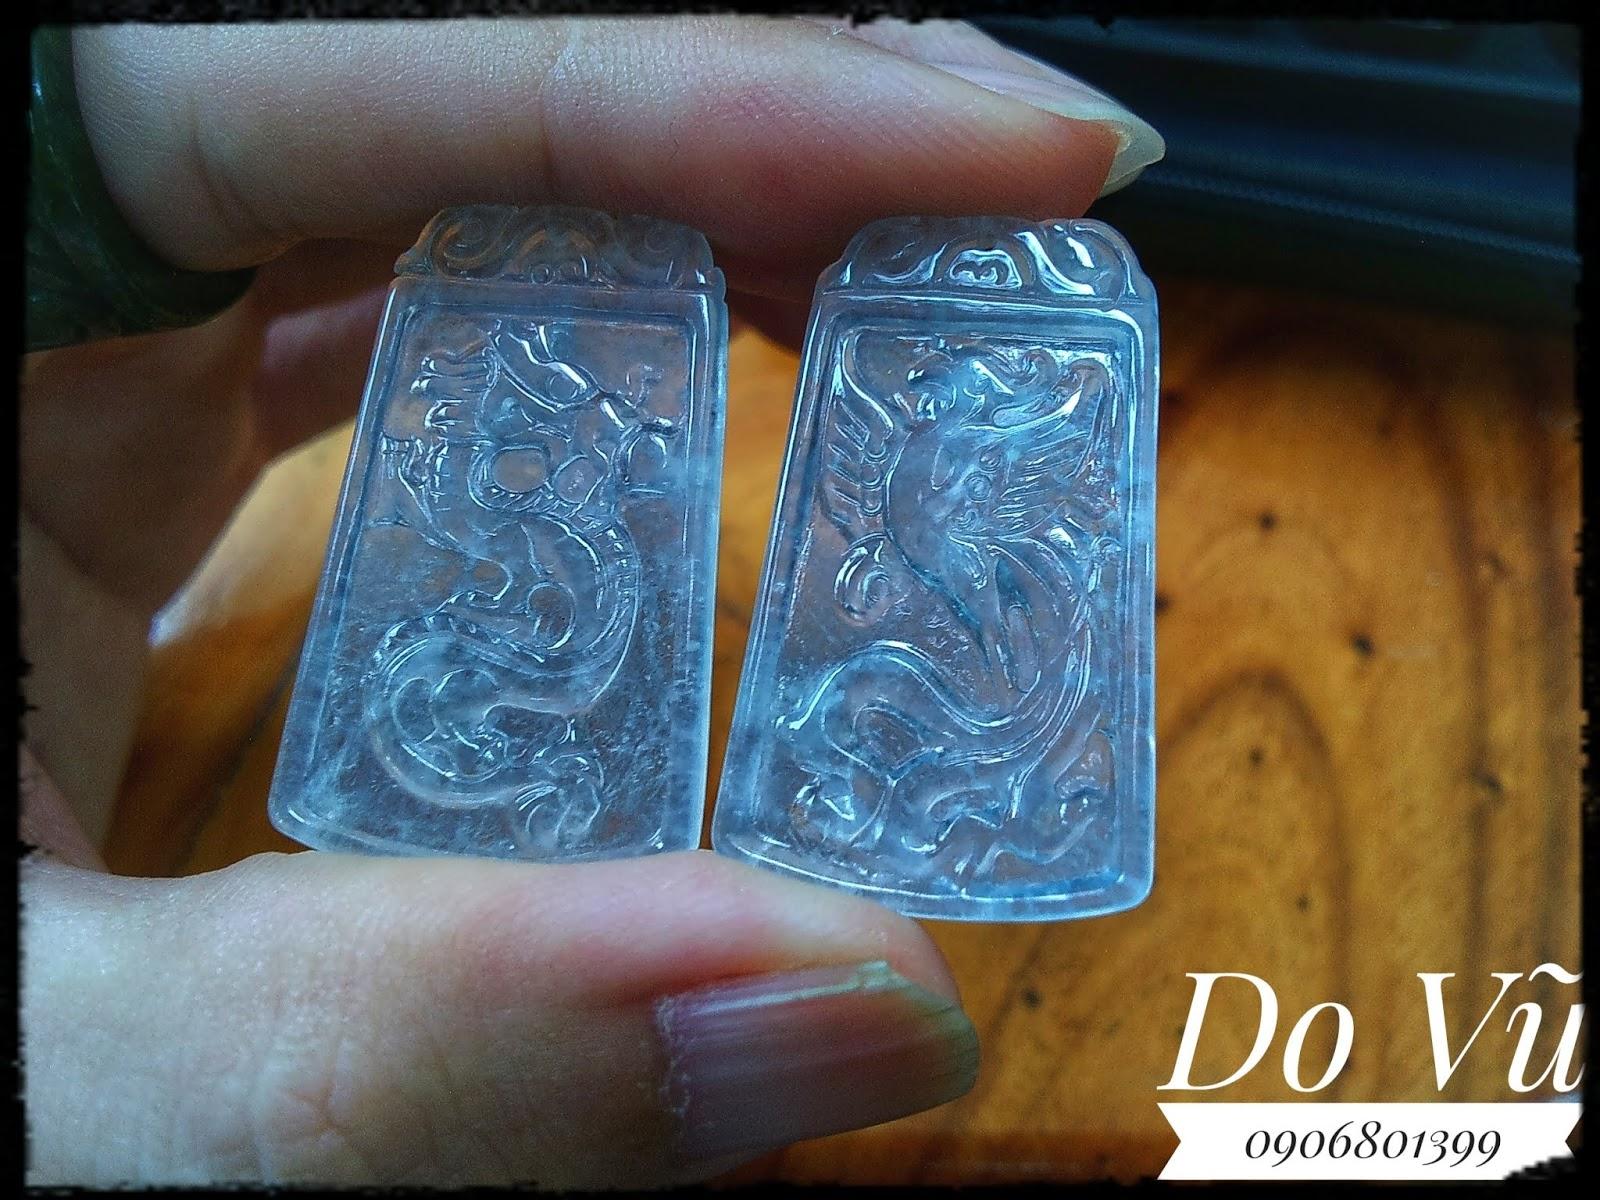 Mặt dây bạch ngọc Long Phụng chuẩn Natural Jadeite Jade type A (19/04/20, 01)